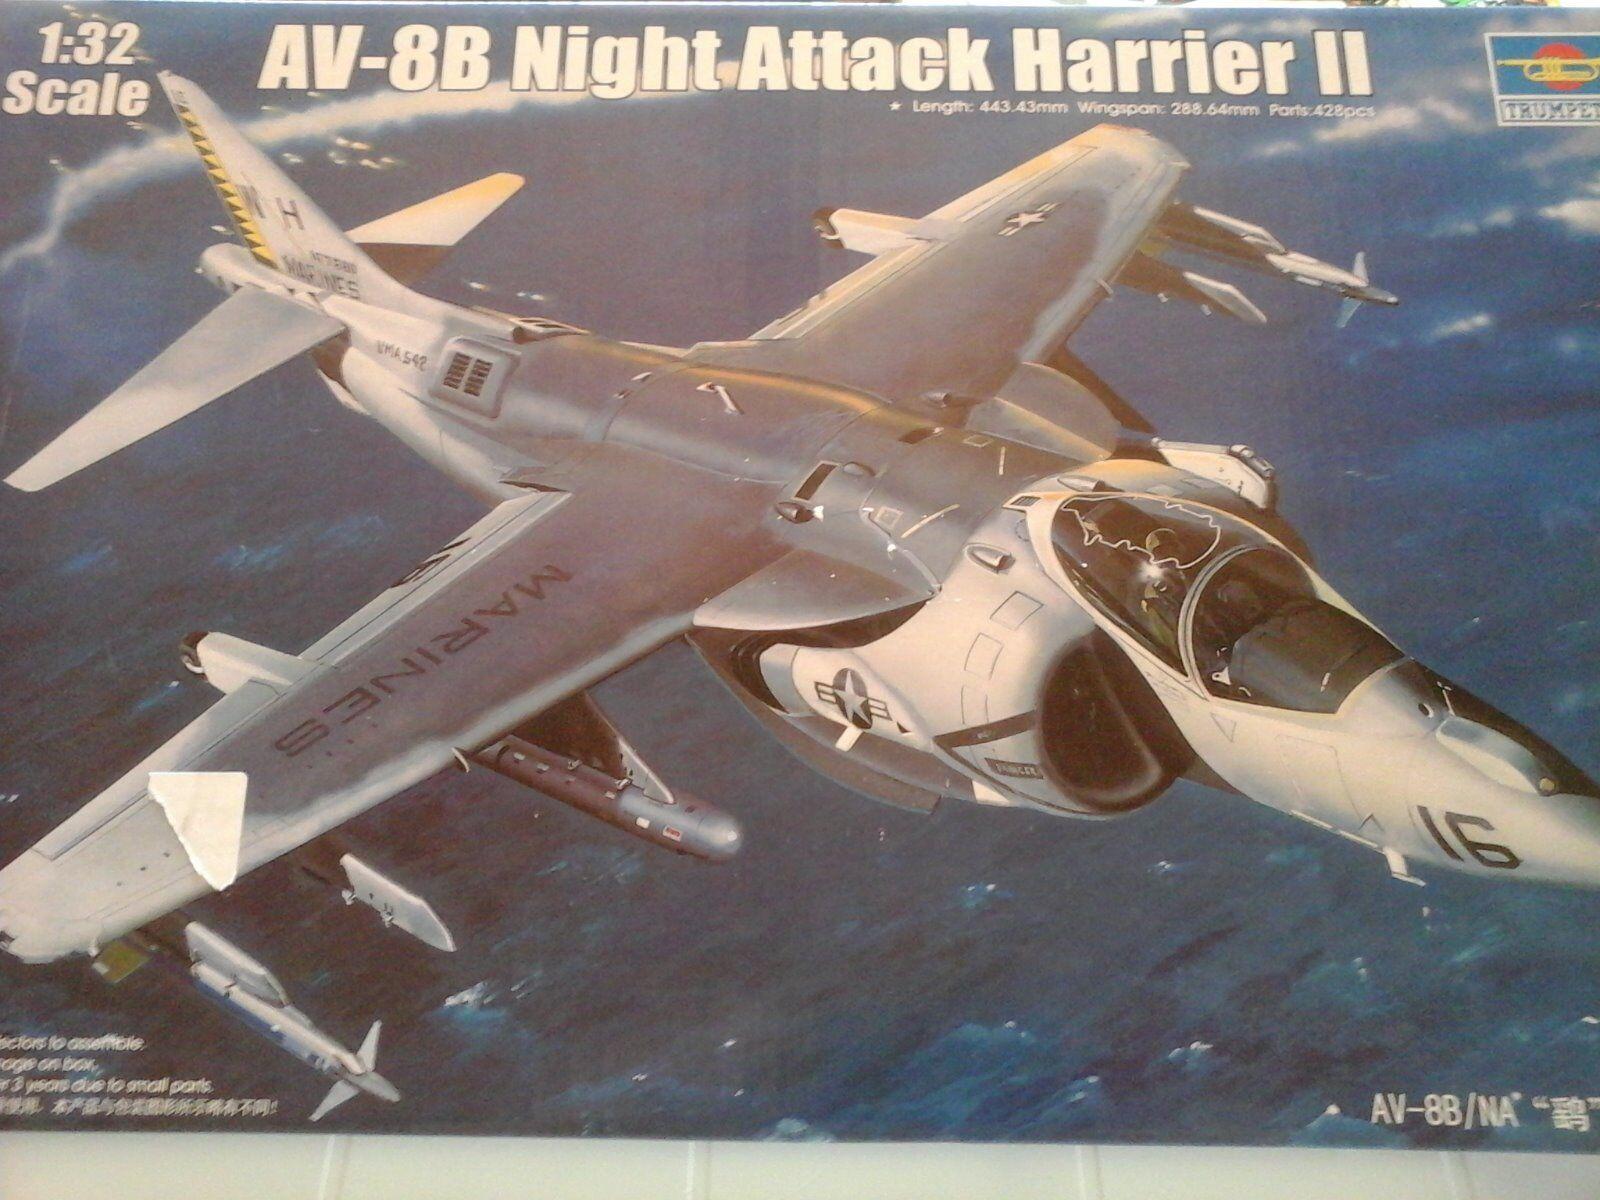 HARRIER II AV8-B NIGHT ATTACK 1/32 SCALE TRUMPETER MODELPHOTOETCHEDRUB.WHEELS